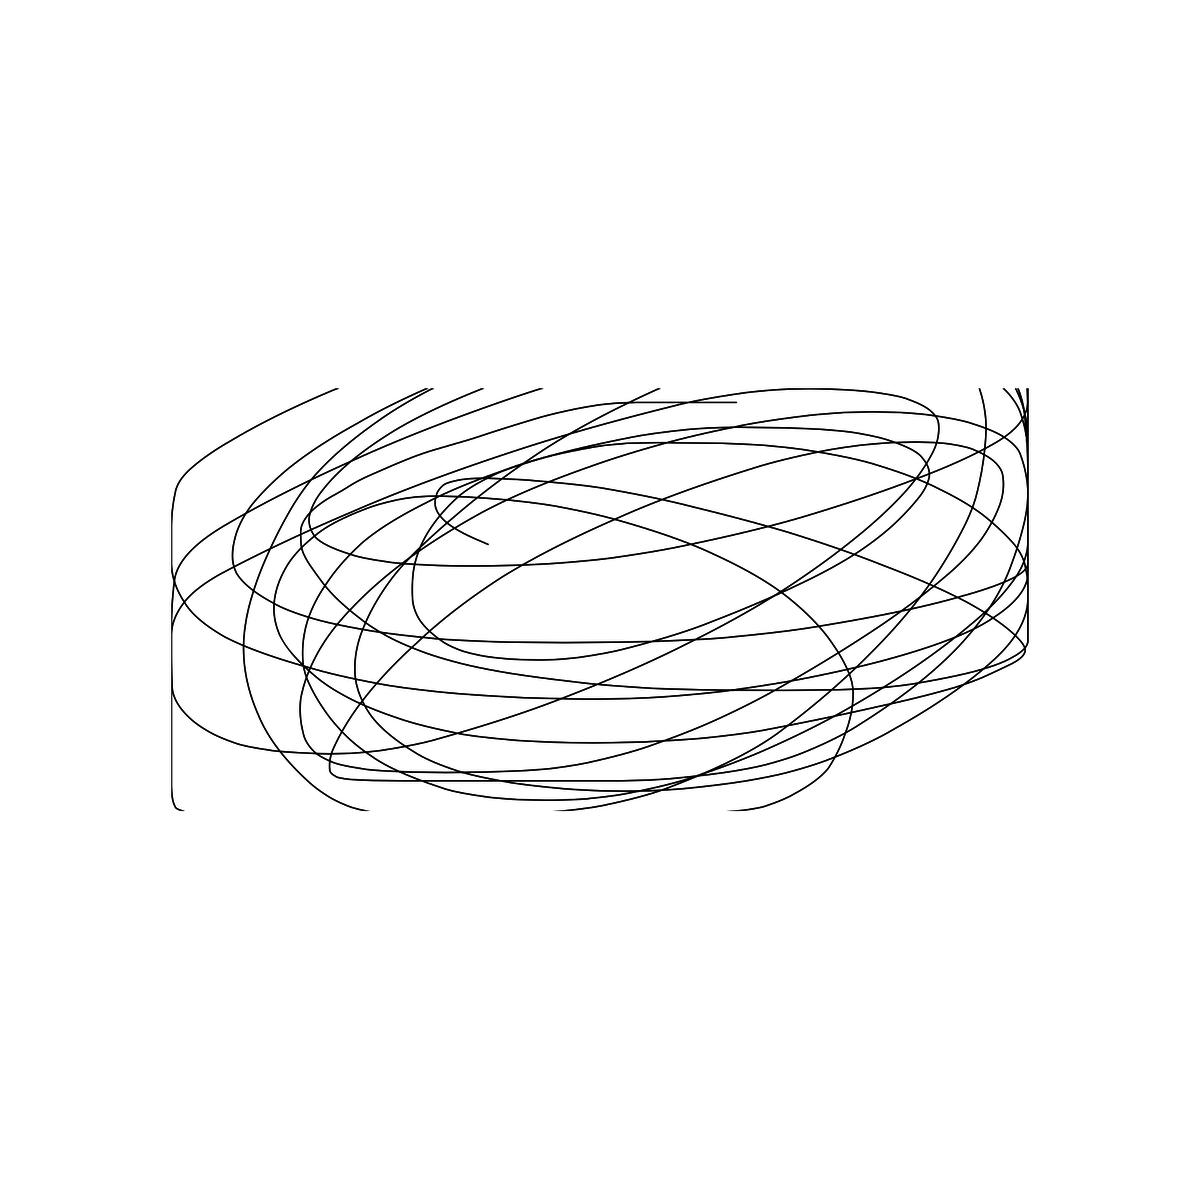 BAAAM drawing#22682 lat:38.2047767639160160lng: -85.7640991210937500